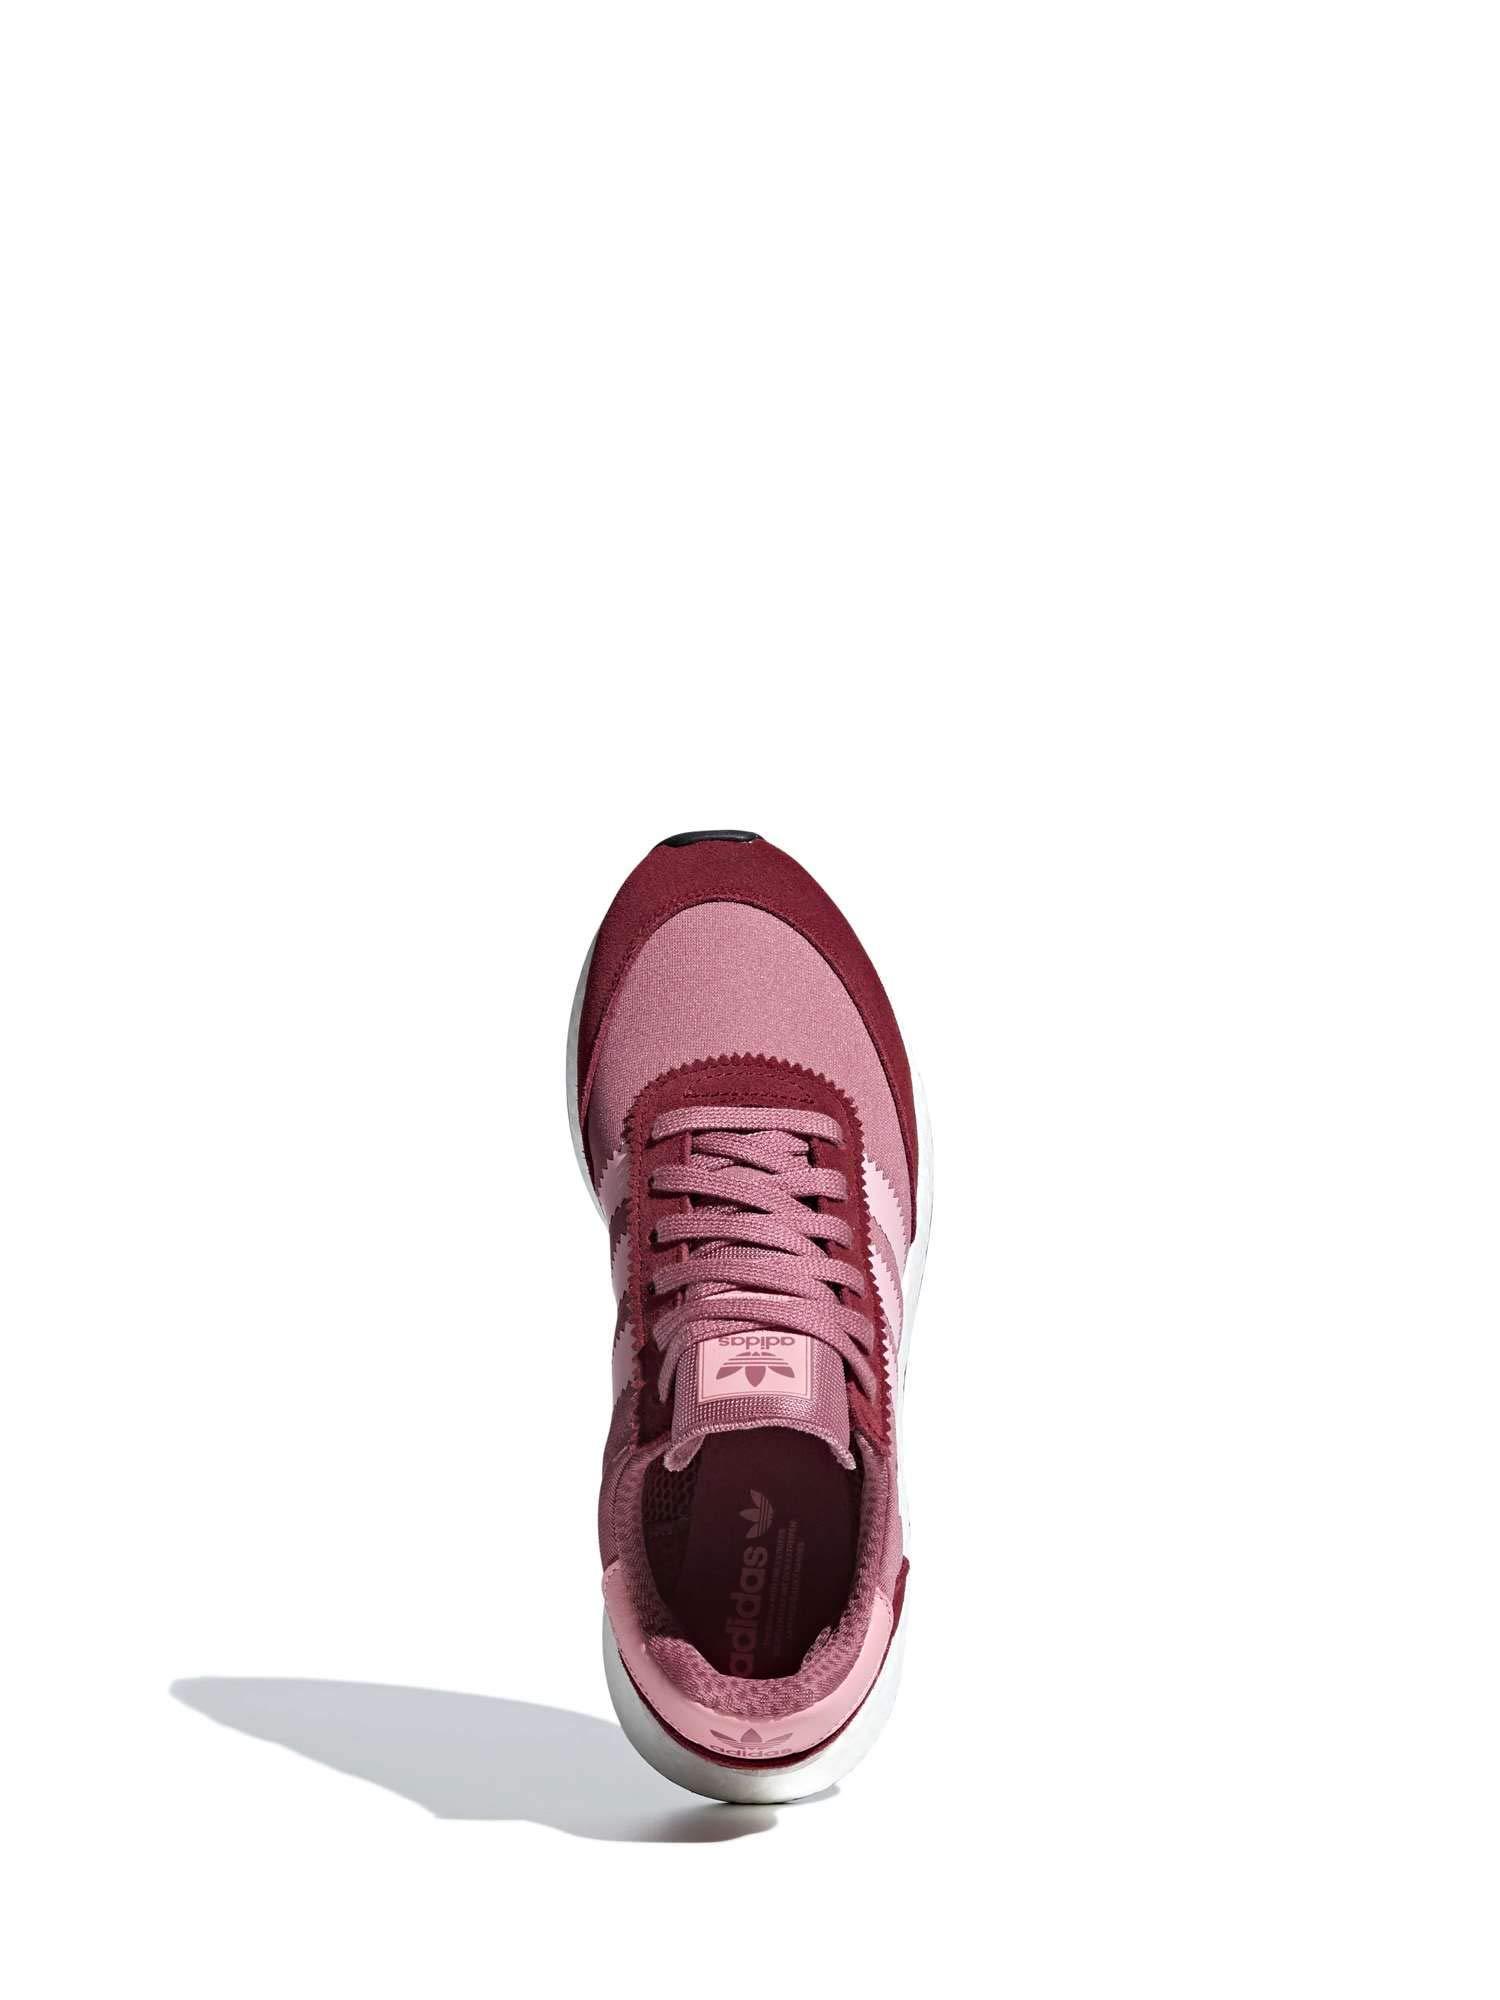 adidas Originals I-5923 Women 2 spesavip